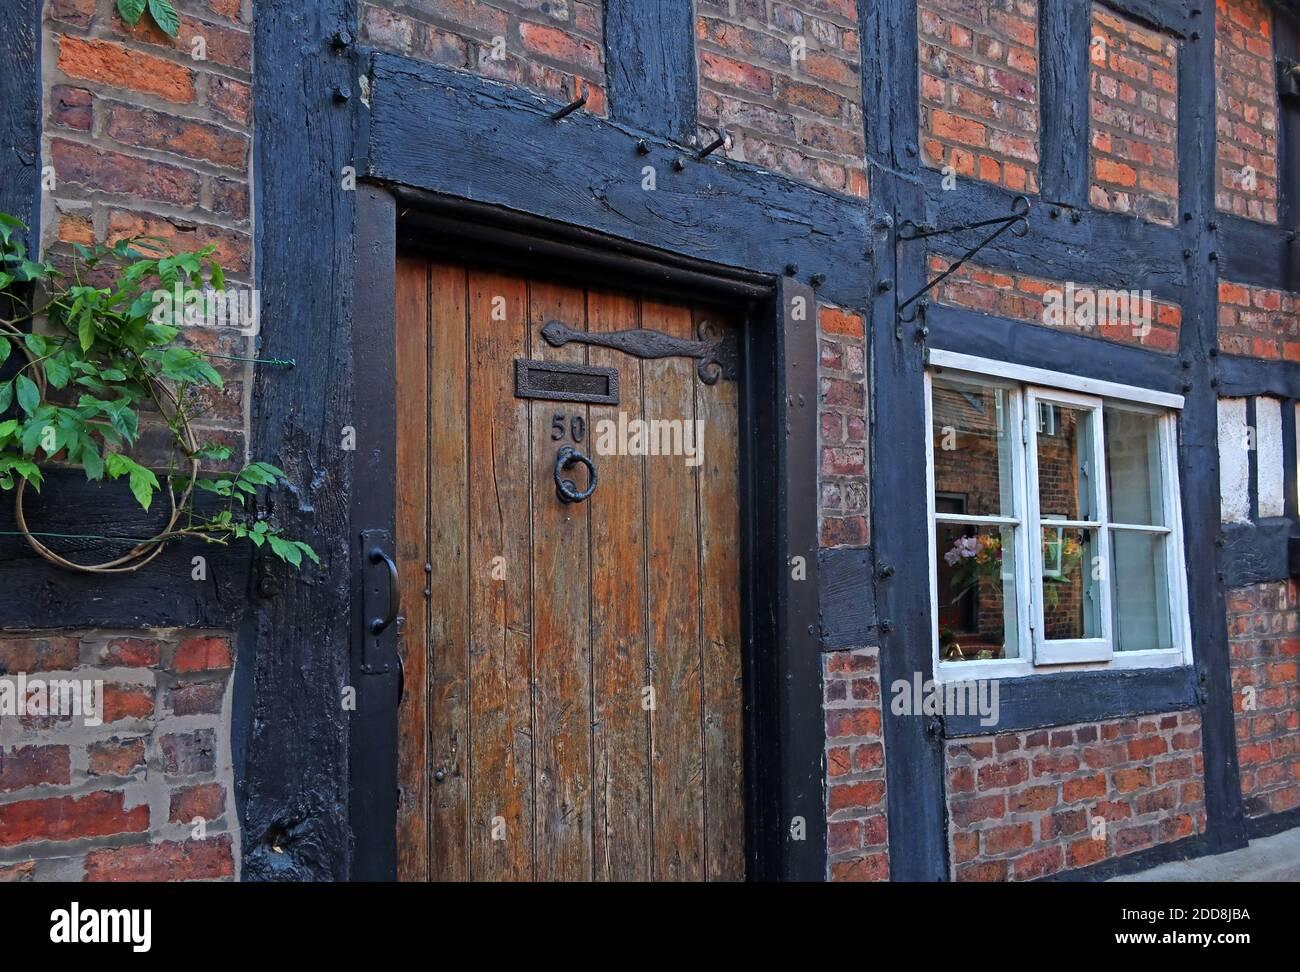 GoTonySmith,Hotpixuk,@Hotpixuk,historic,history,Northwich,Cheshire,England,UK,number50,timber,building,brick,mix,wooden door,old,50 Church street,tudor,frame,framed,style,CW9